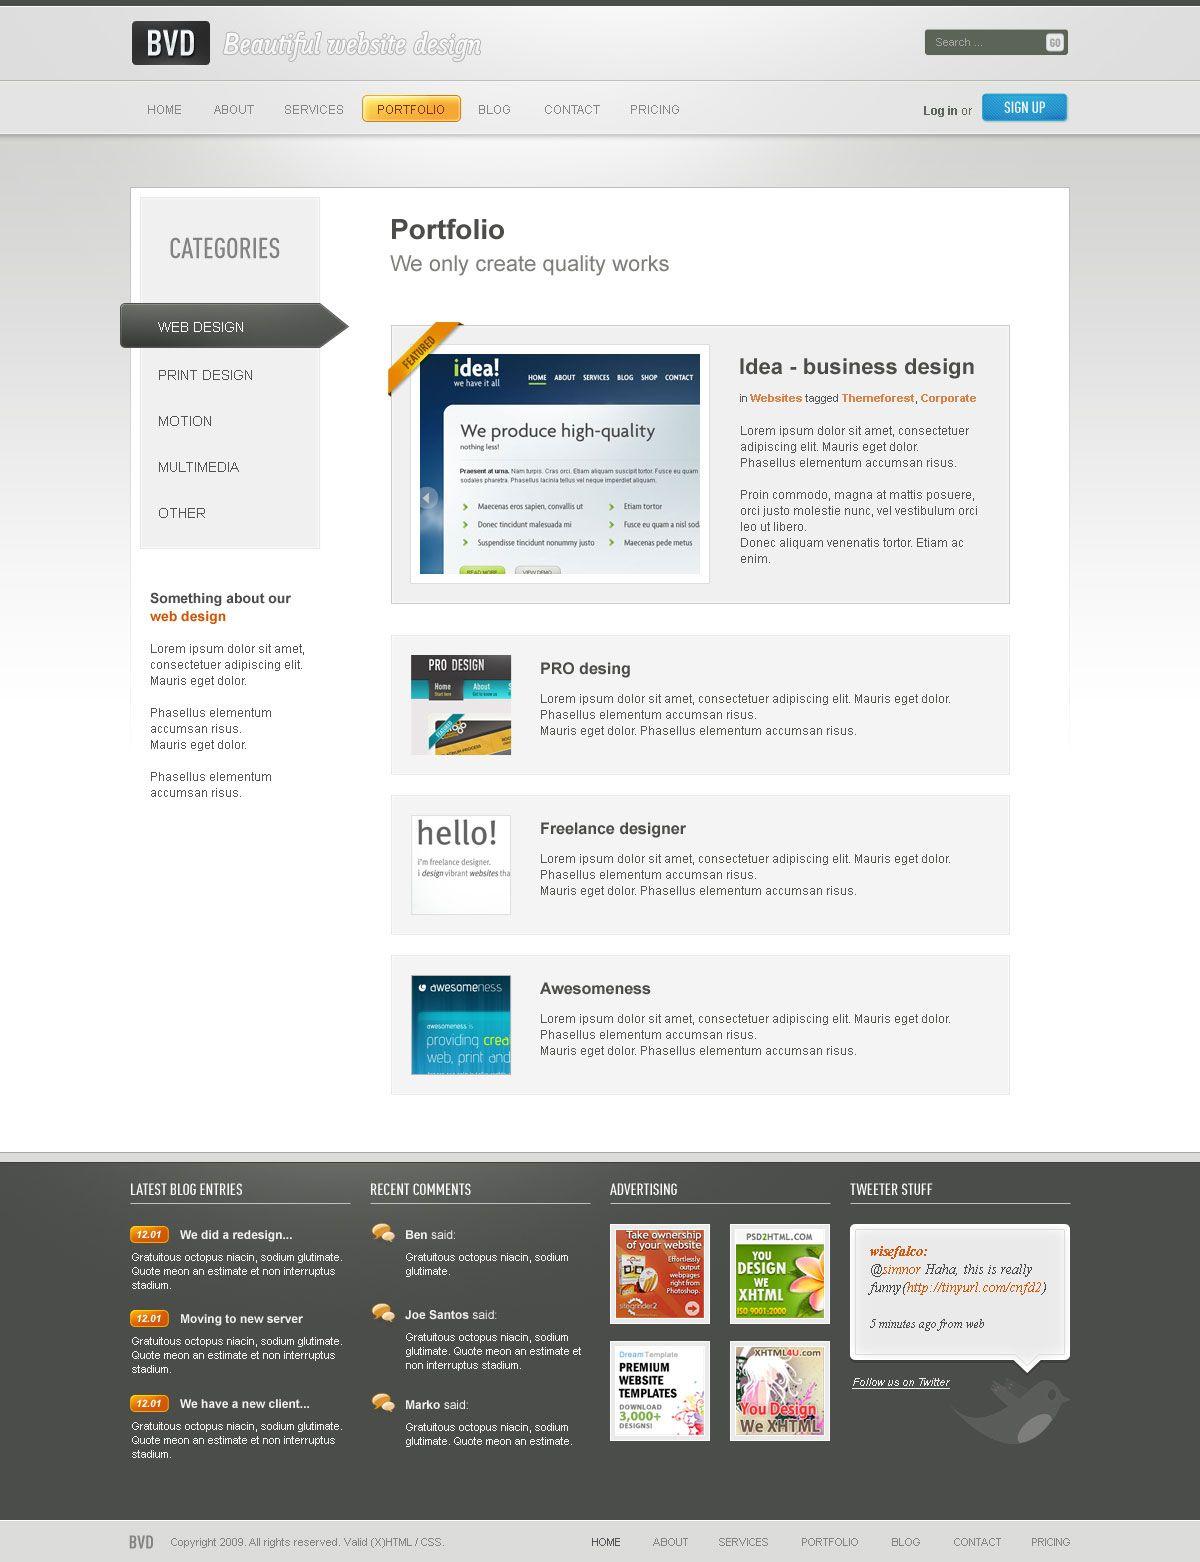 Bvd Beautiful Website Design Html Beautiful Website Design Website Design Web Design